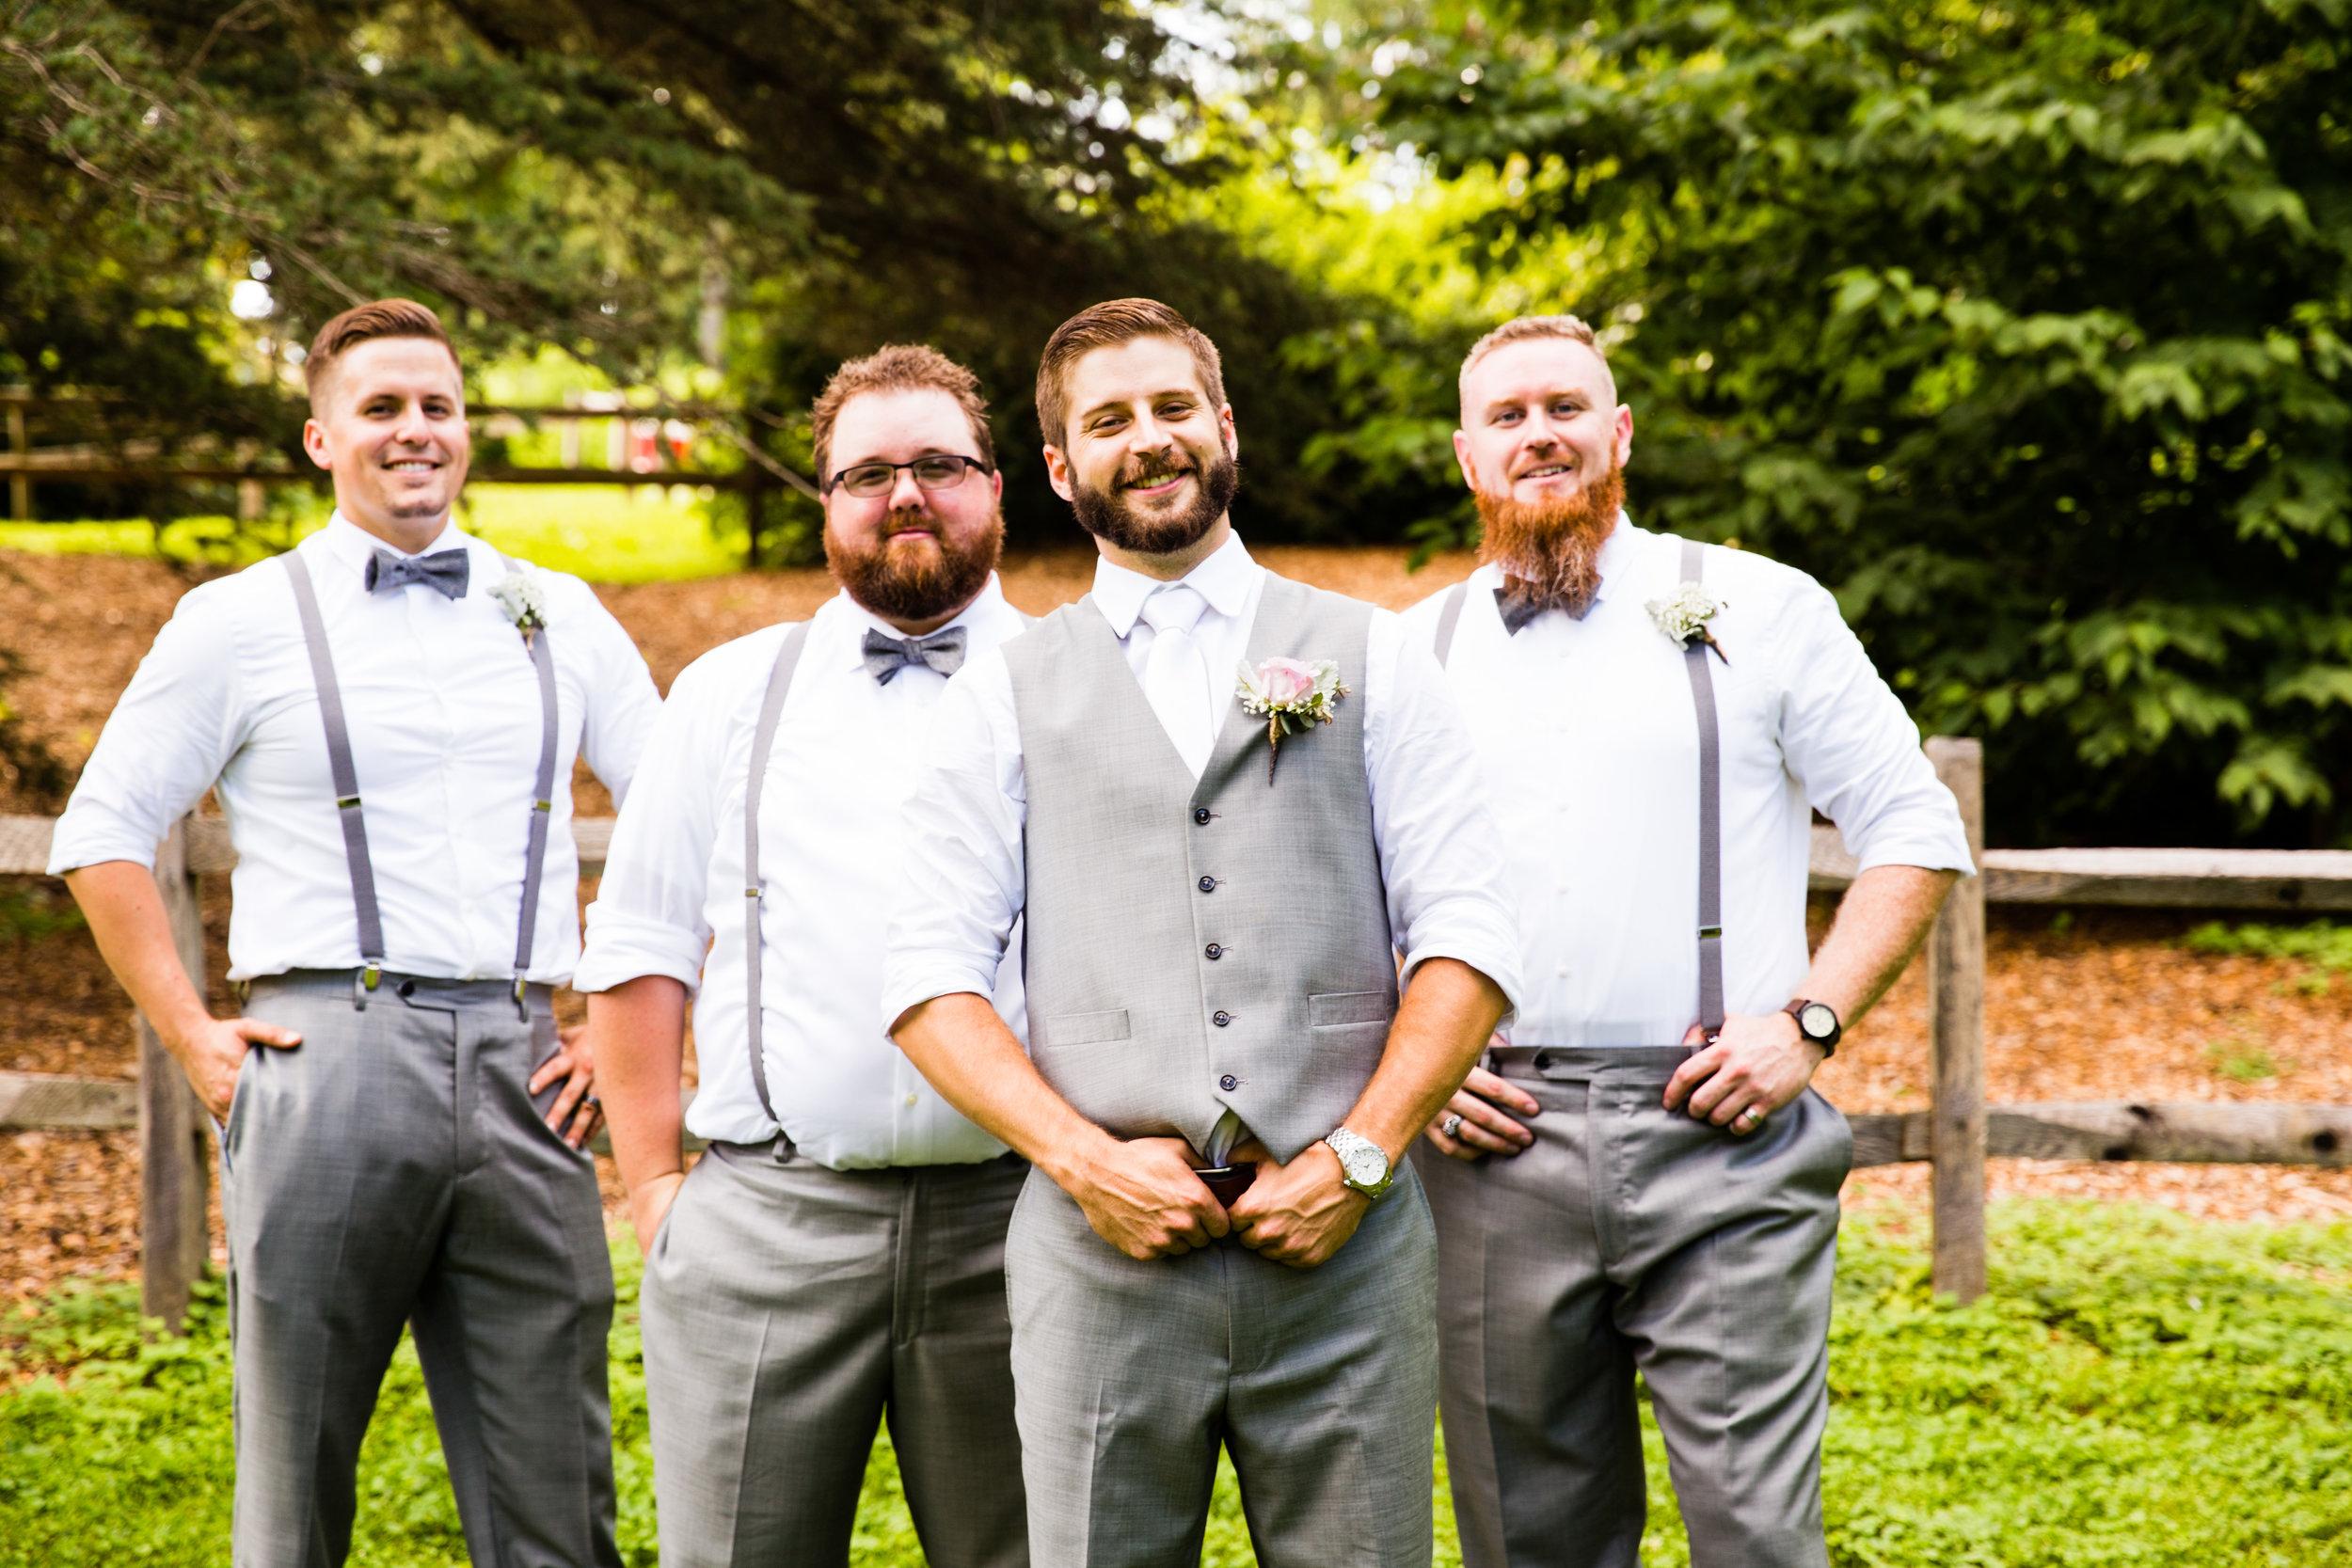 TYLER ARBORETUM WEDDING PHOTOGRAPHY LOVESTRUCK PICTURES-025.jpg